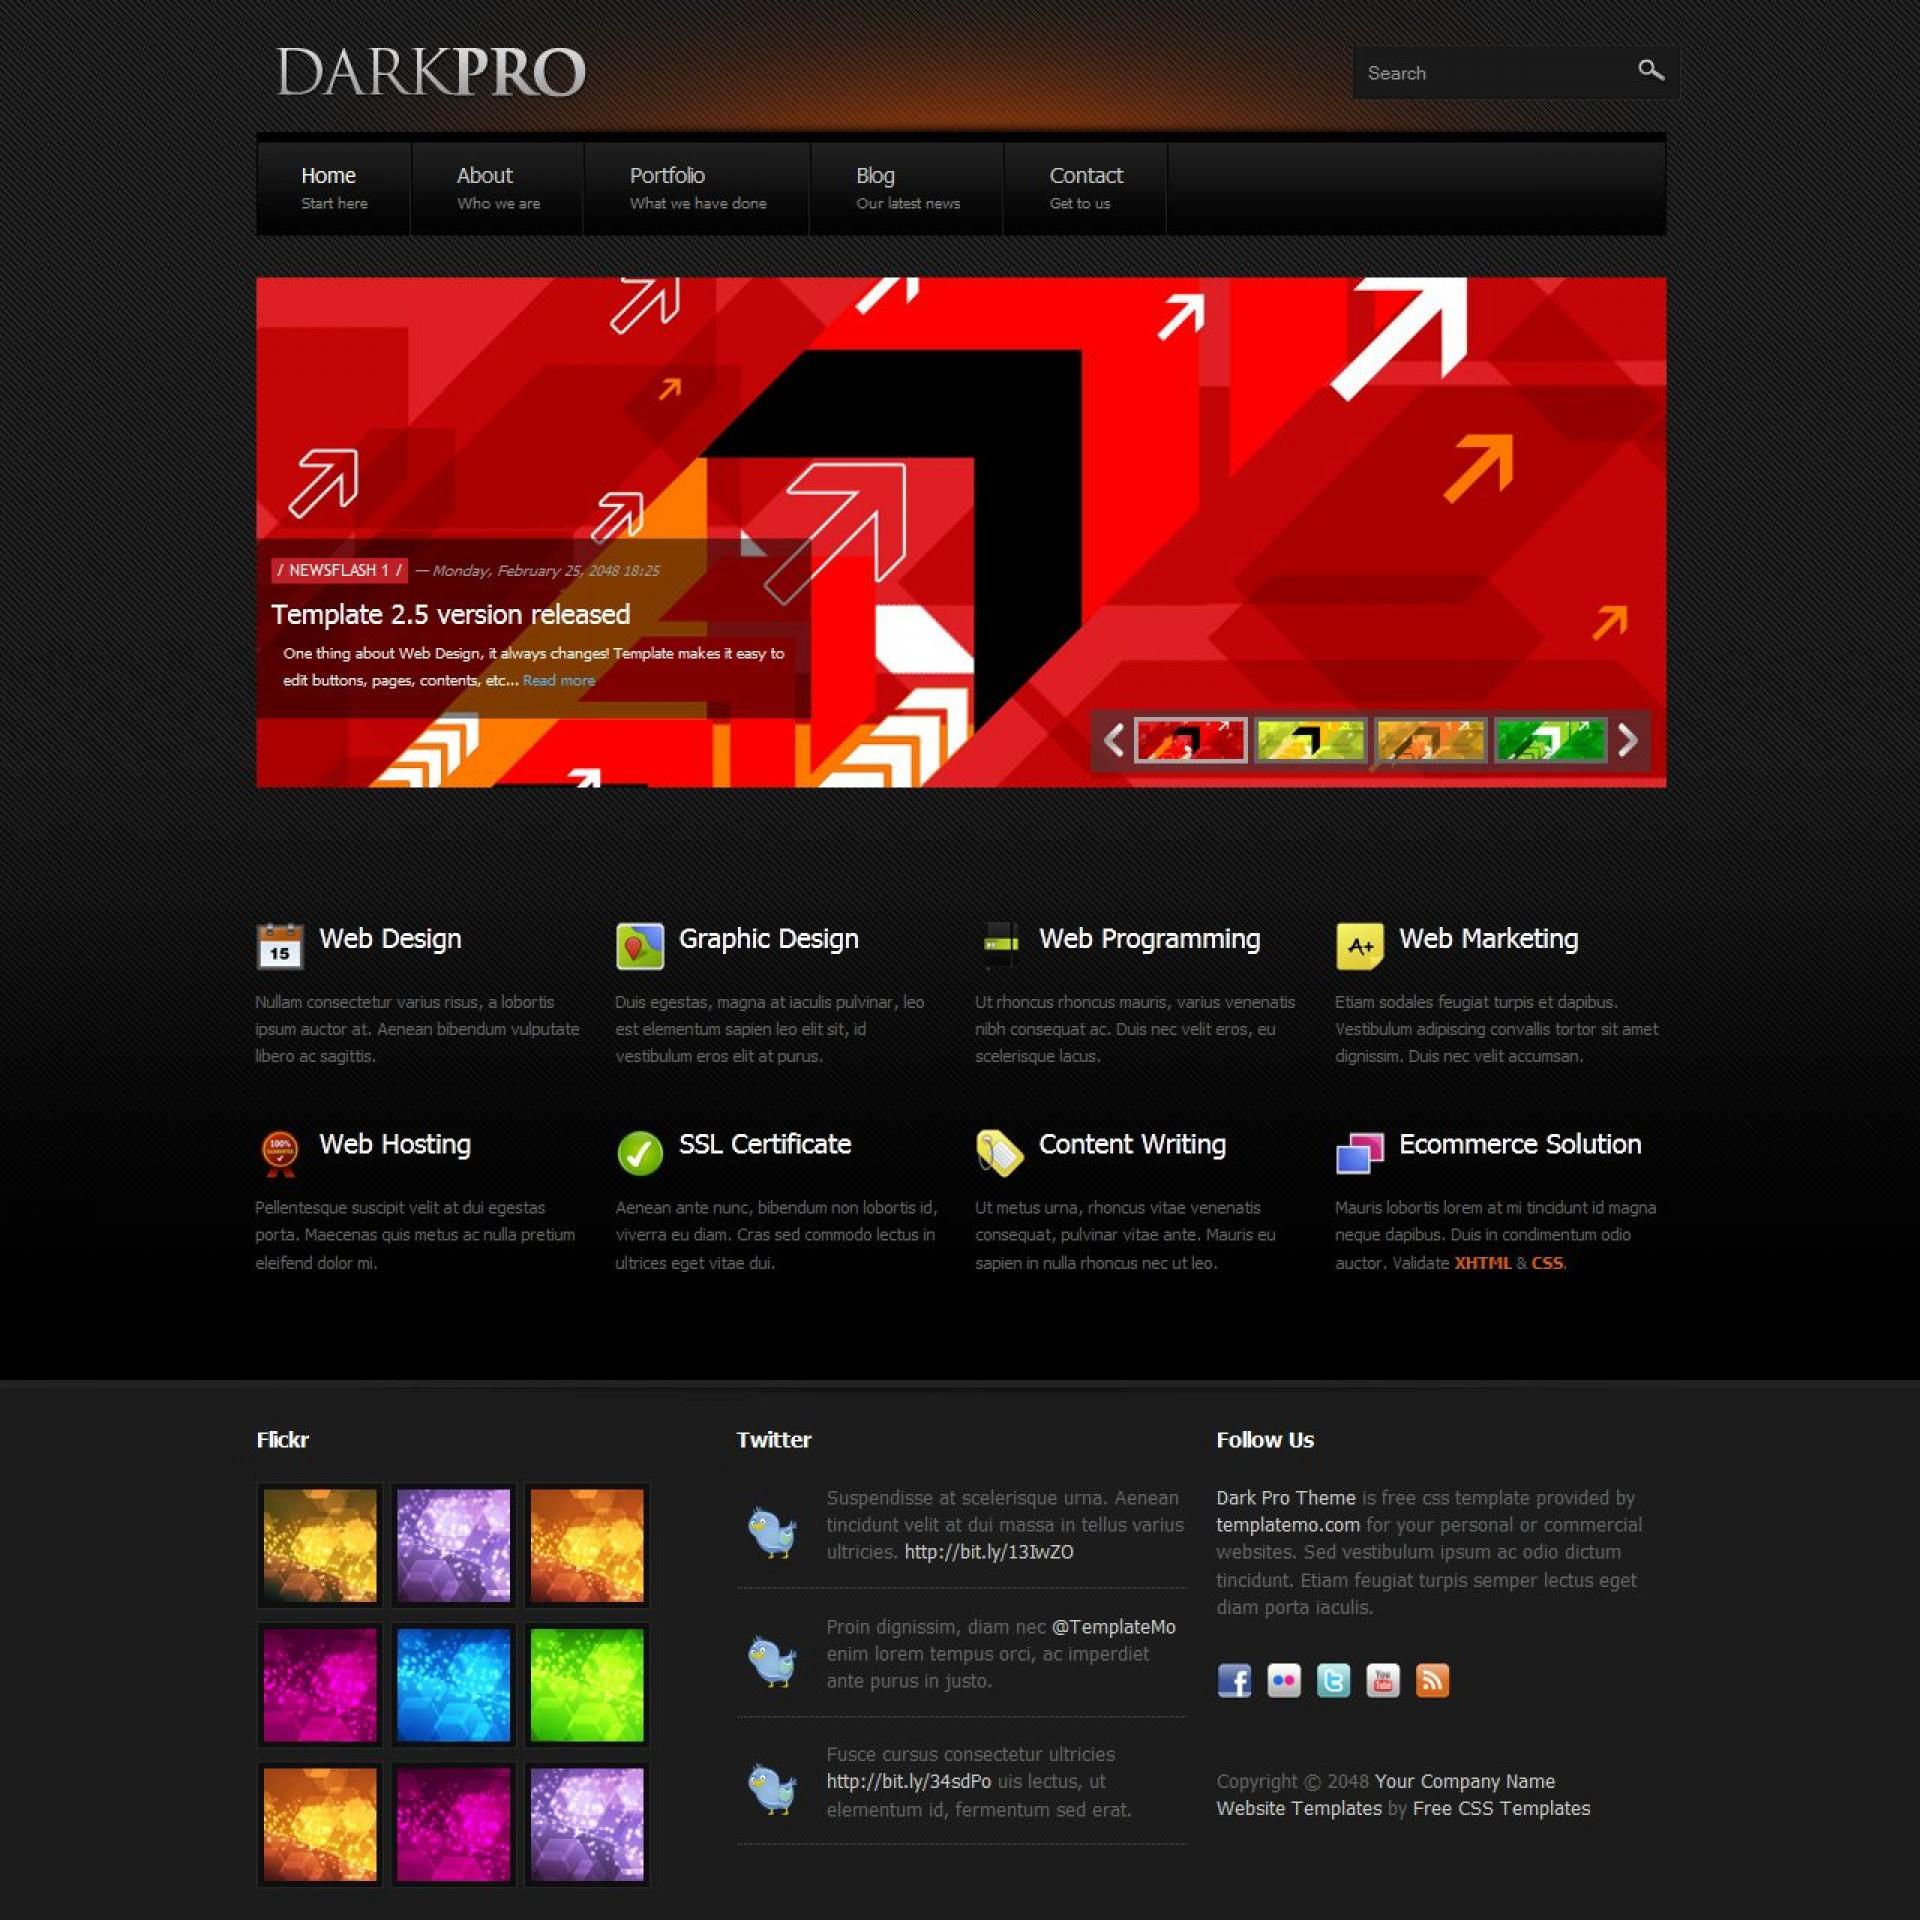 008 Impressive Html5 Menu Bar Template Free Download Concept 1920